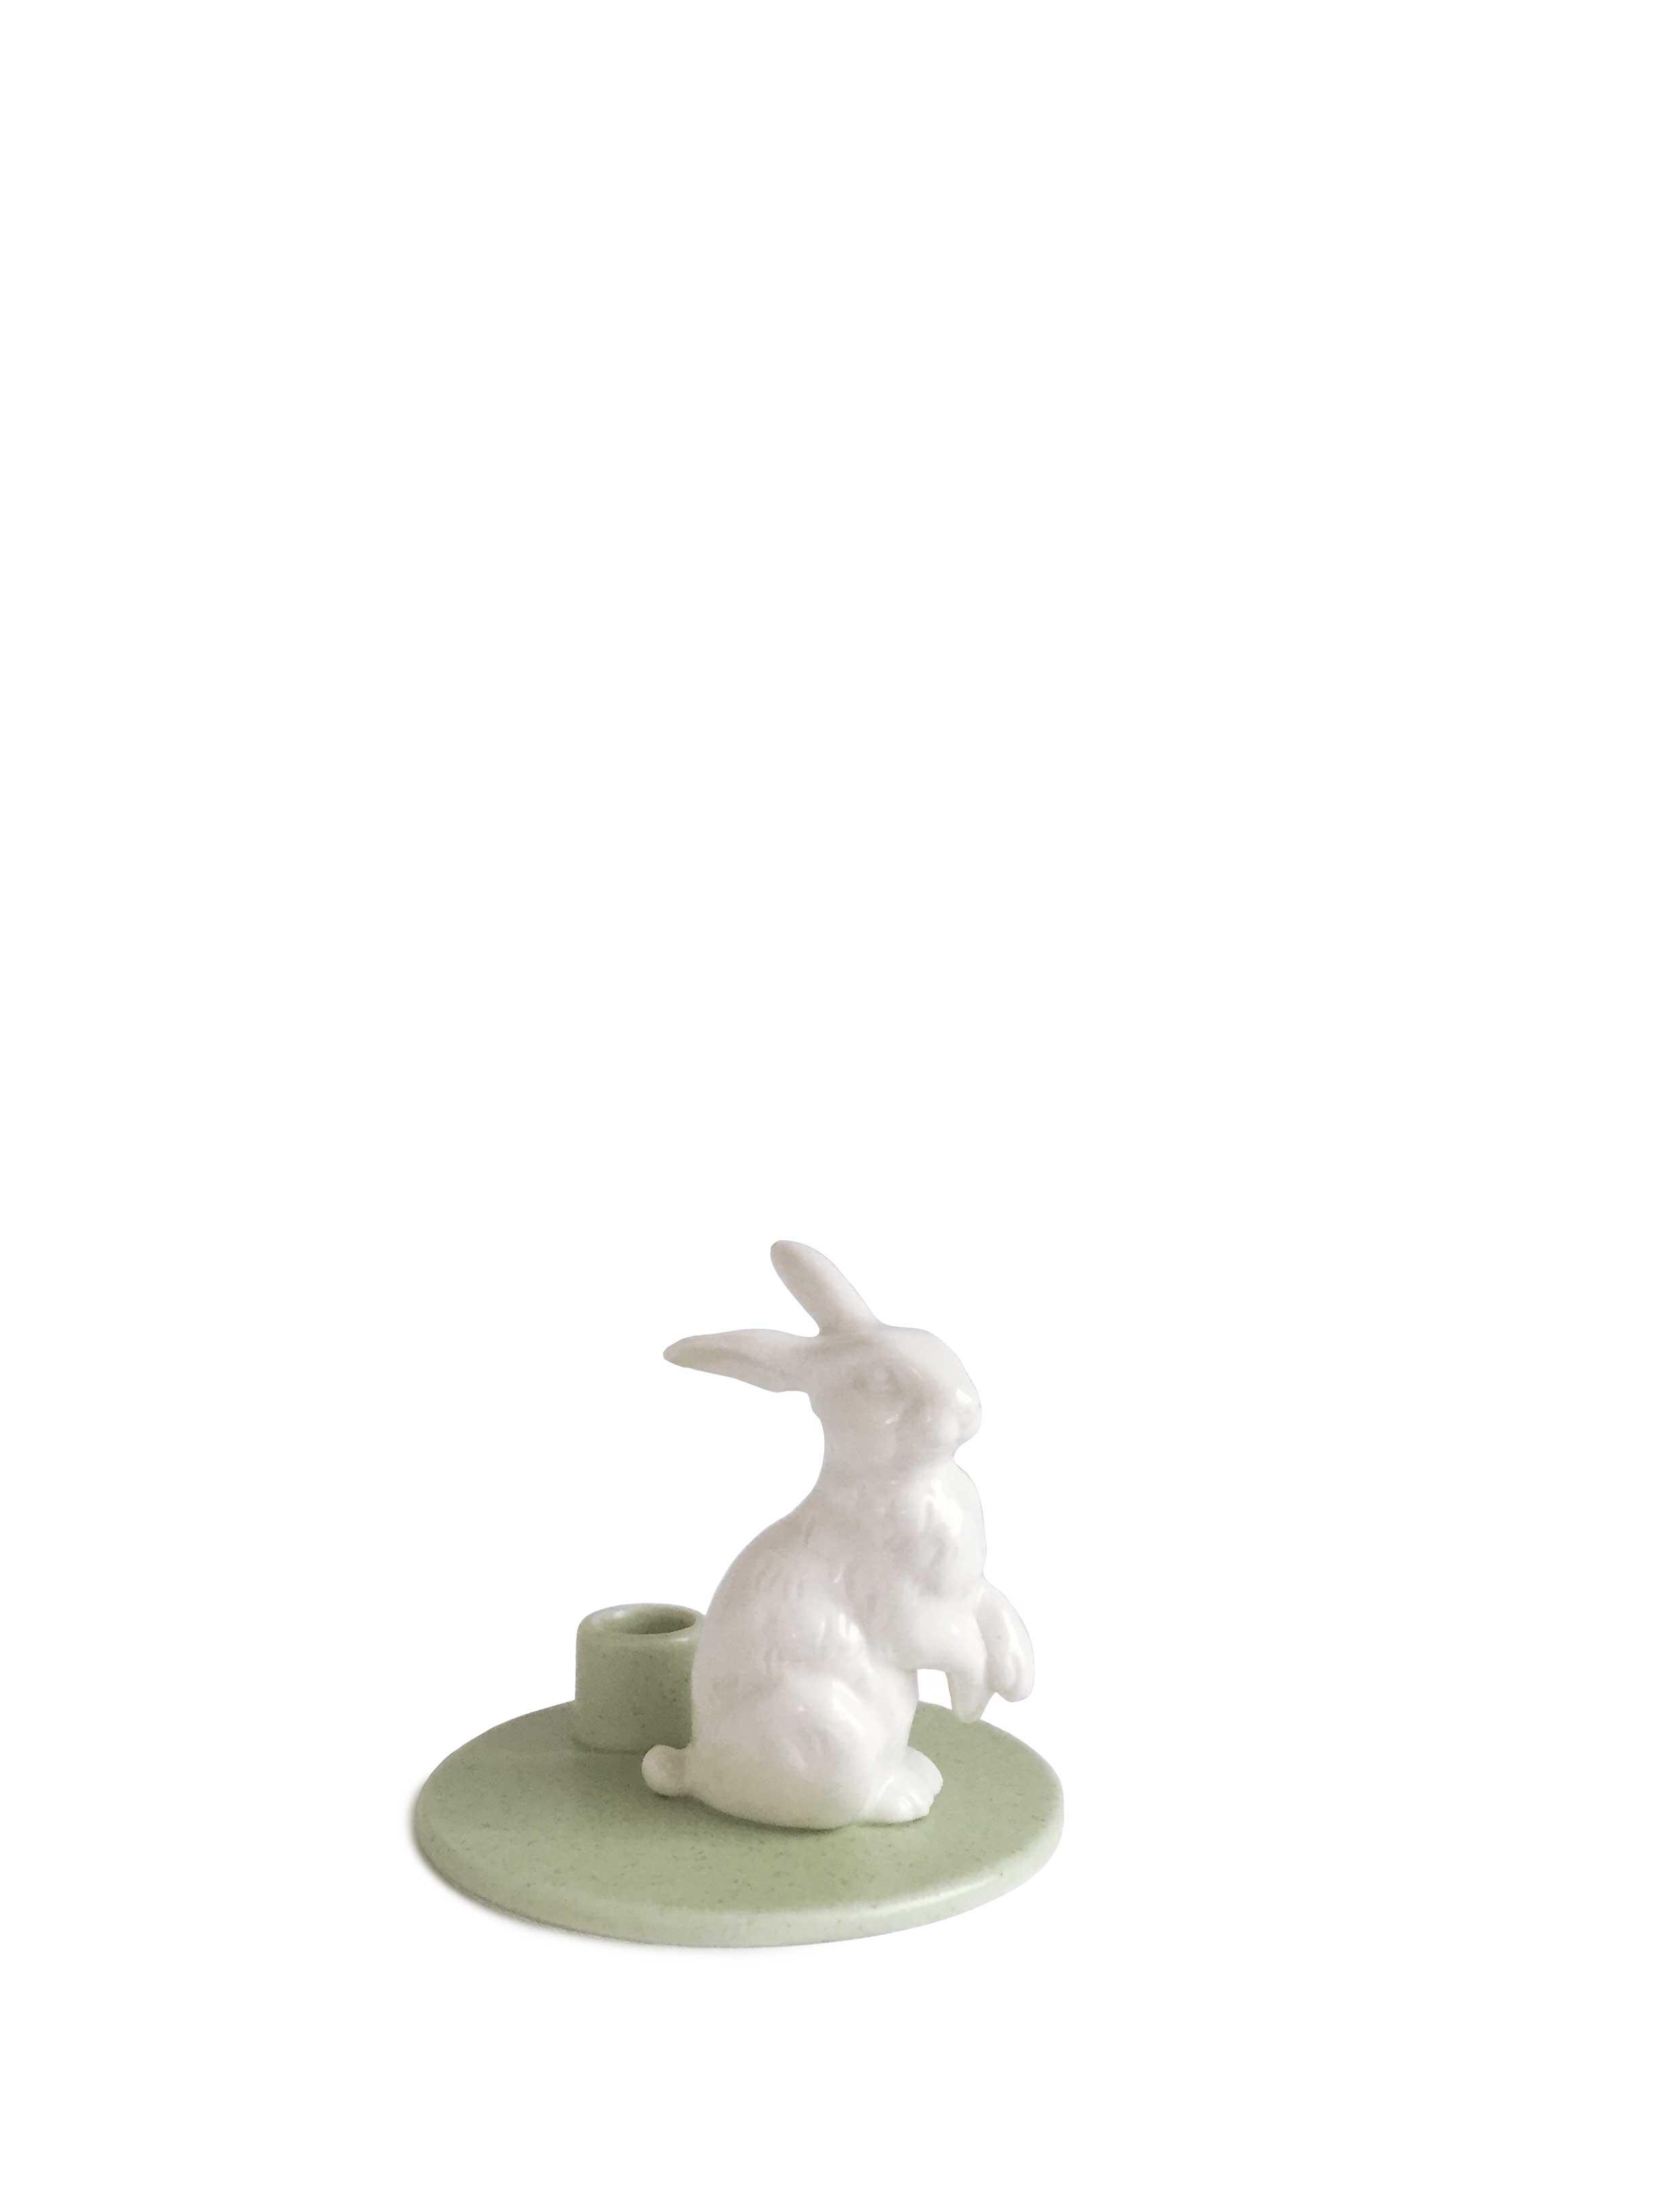 DOTTIR Birthday Stories lysestage, Hare, green